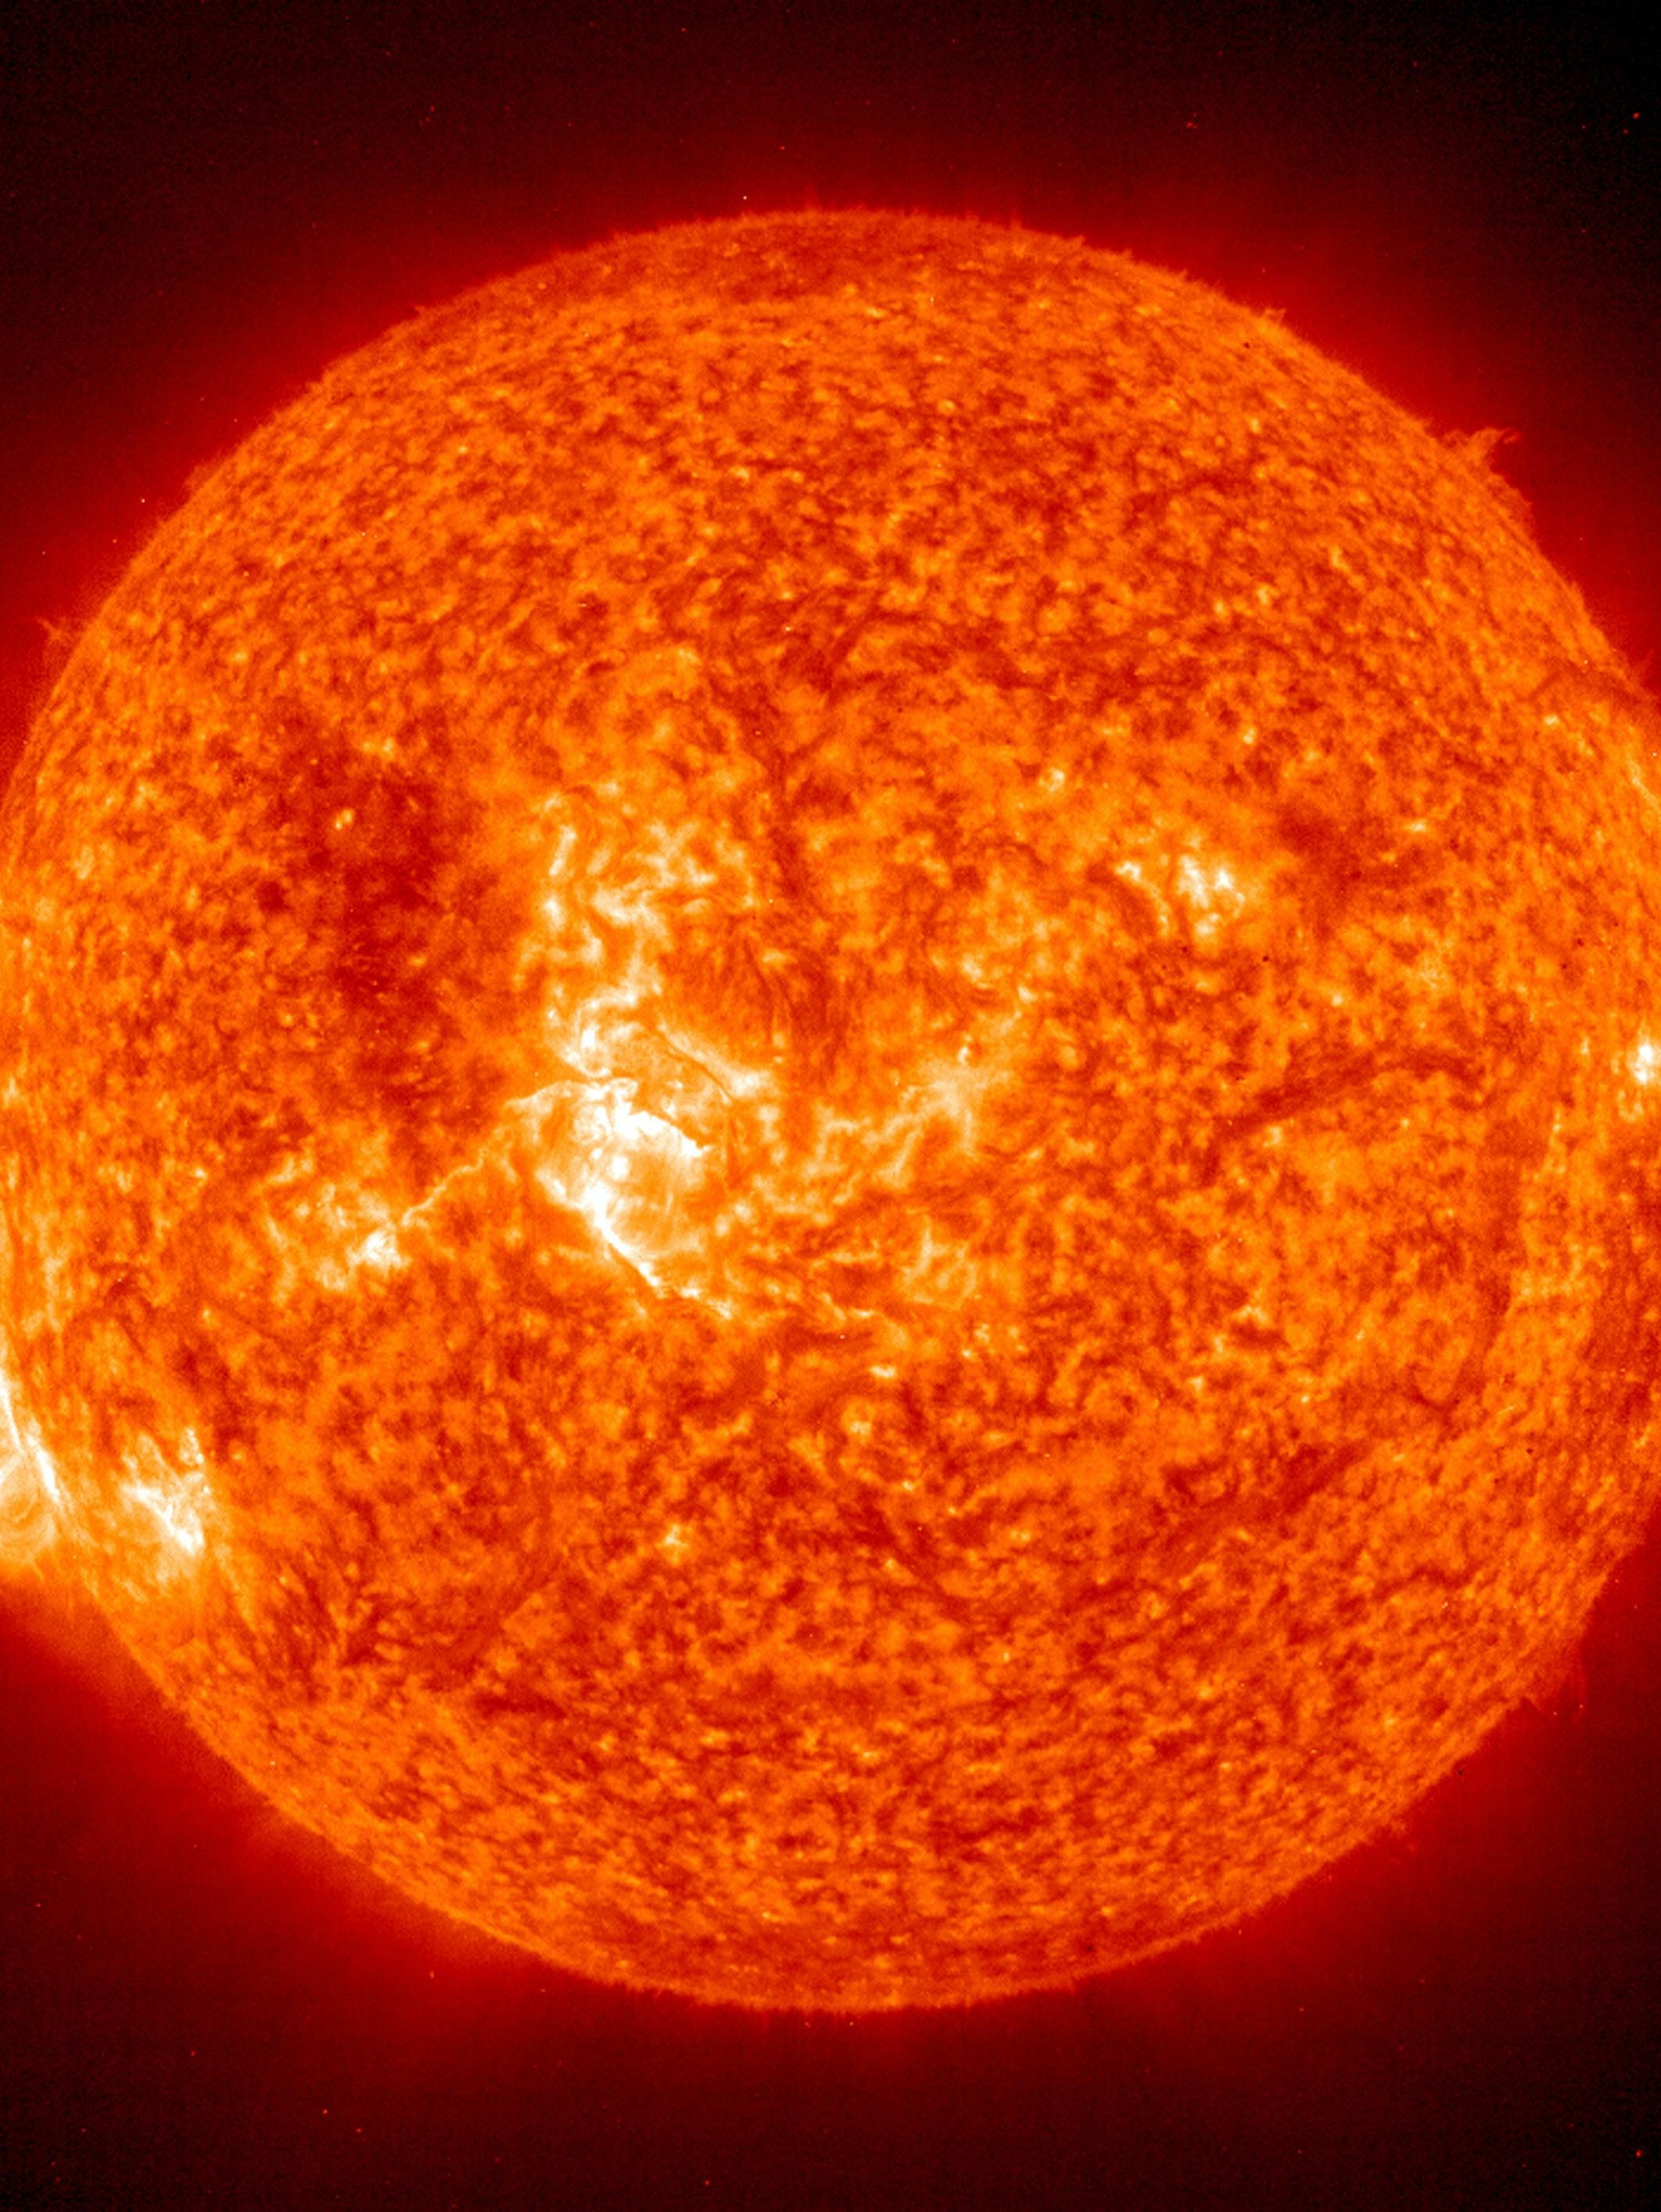 no spots on the sun